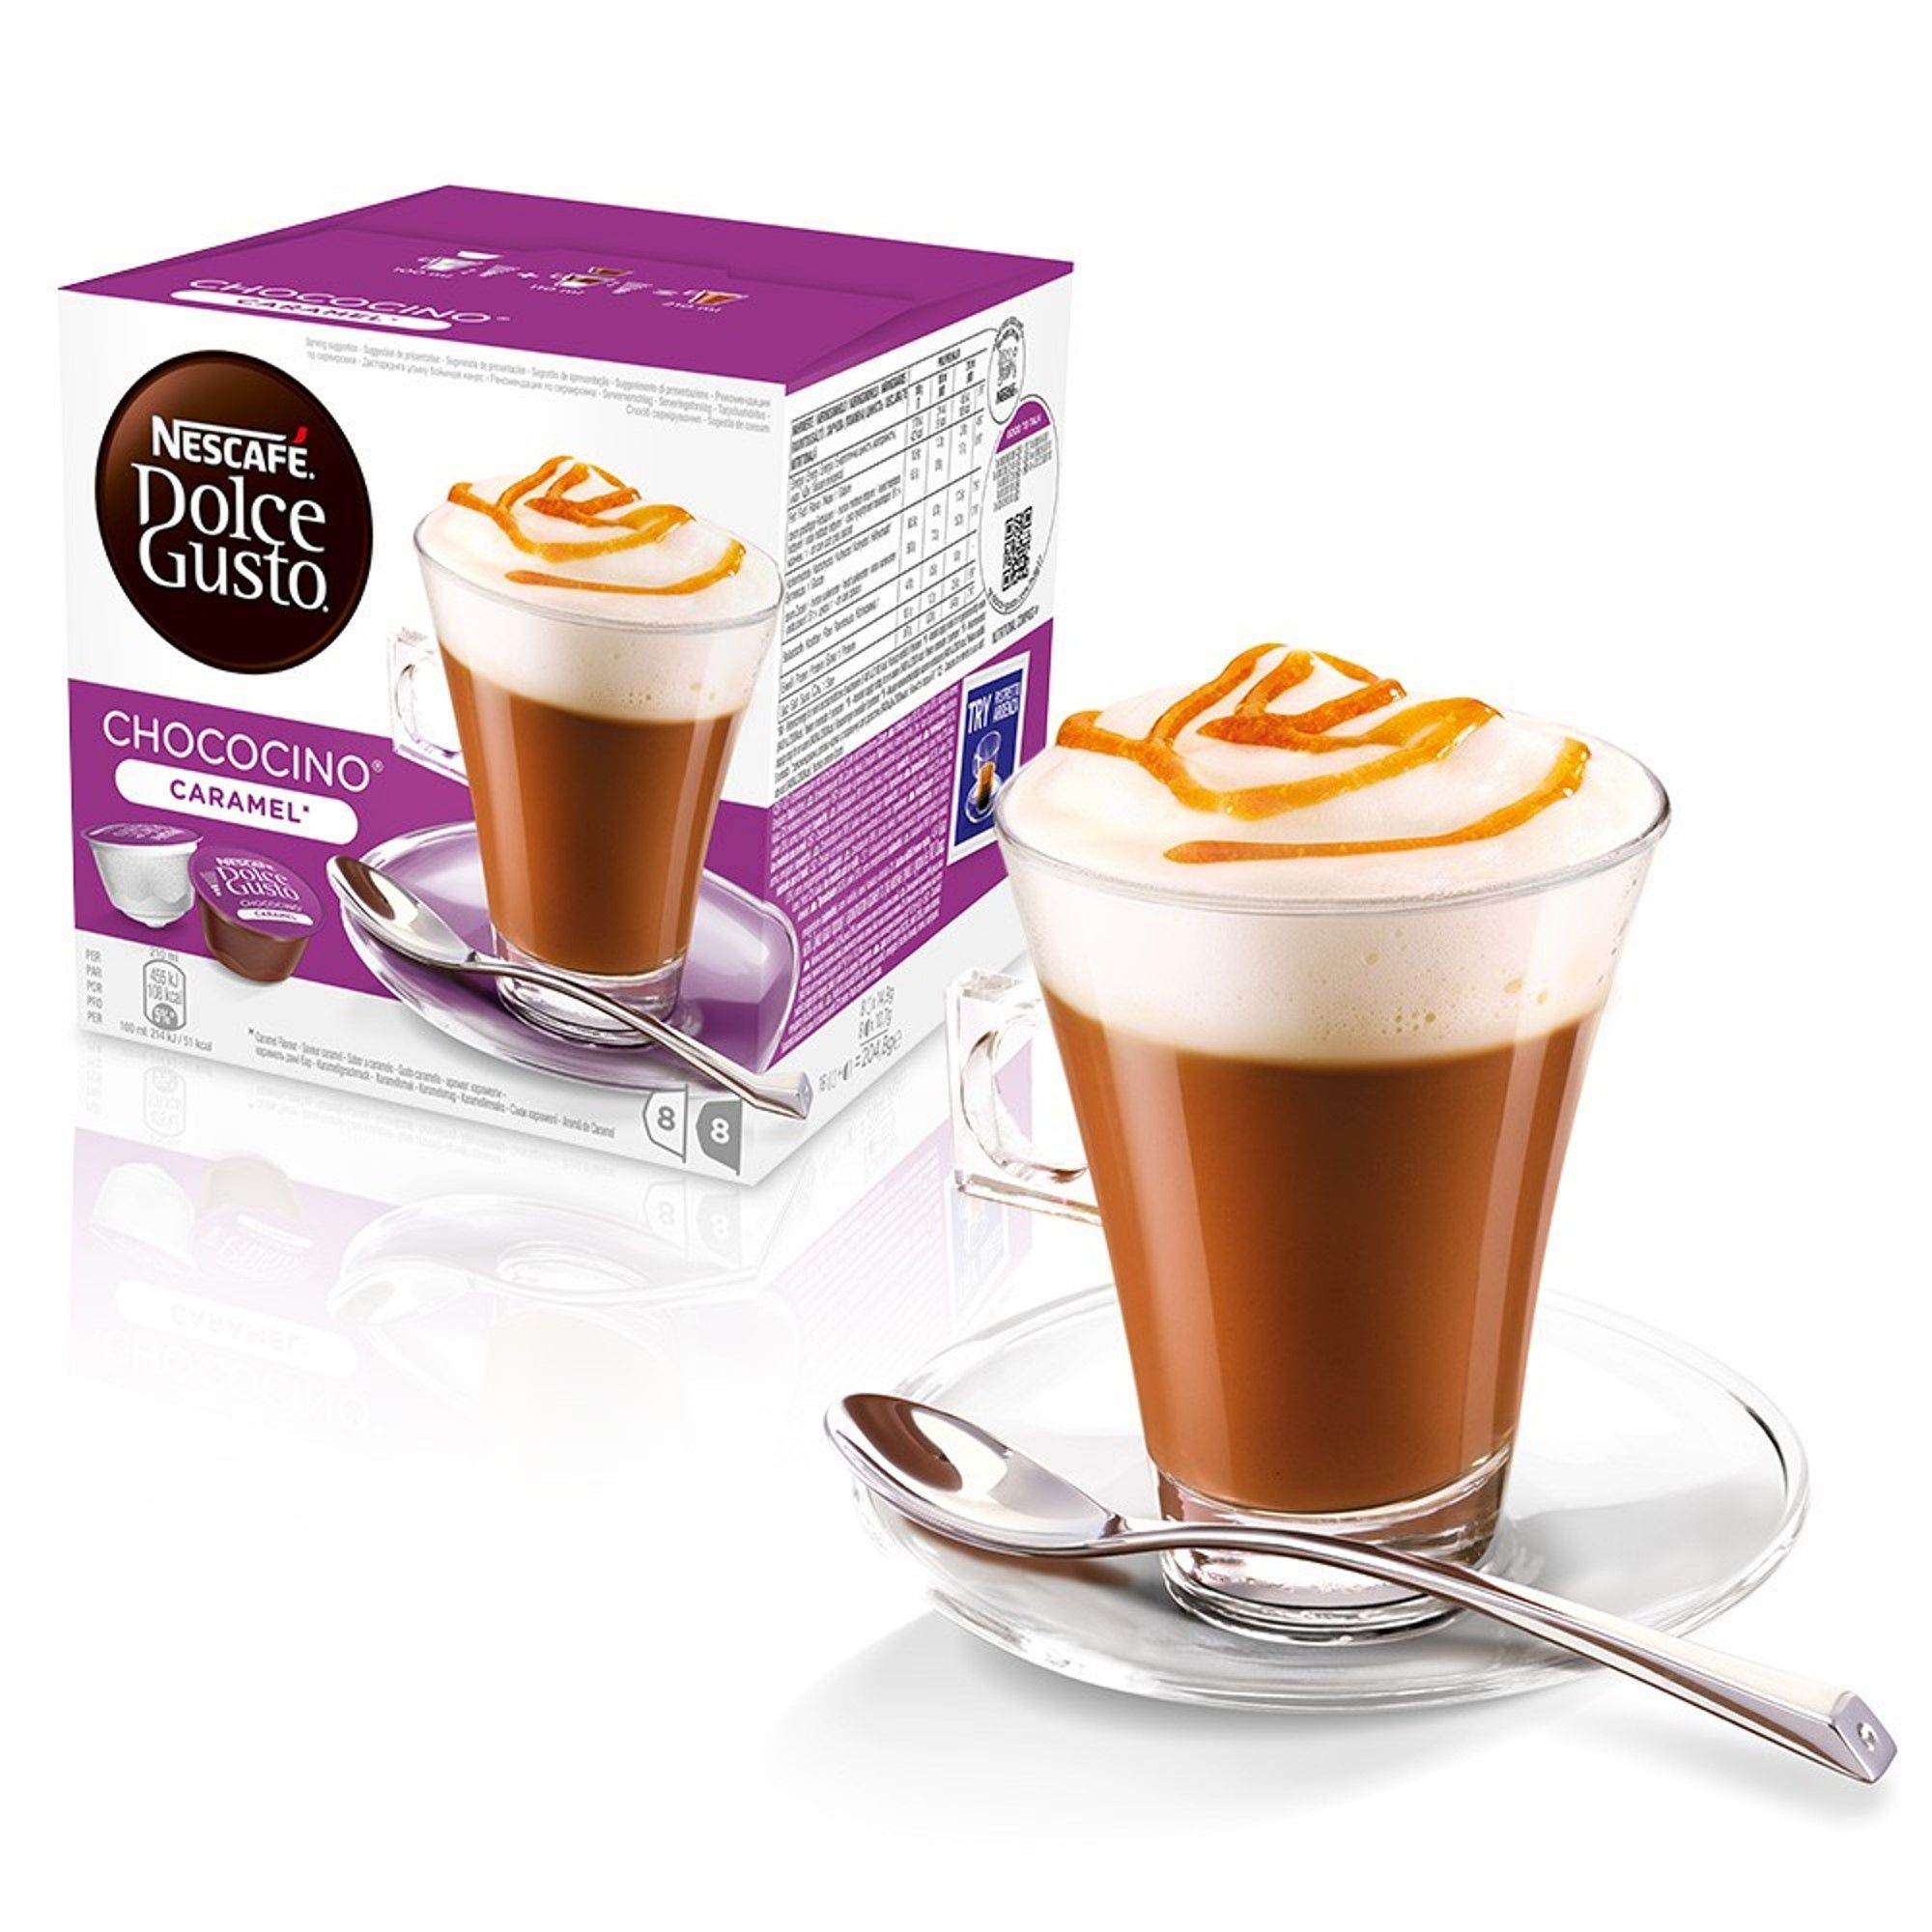 Nescafe Dolce Gusto Chococino Caramel Hot Chocolate Coffee